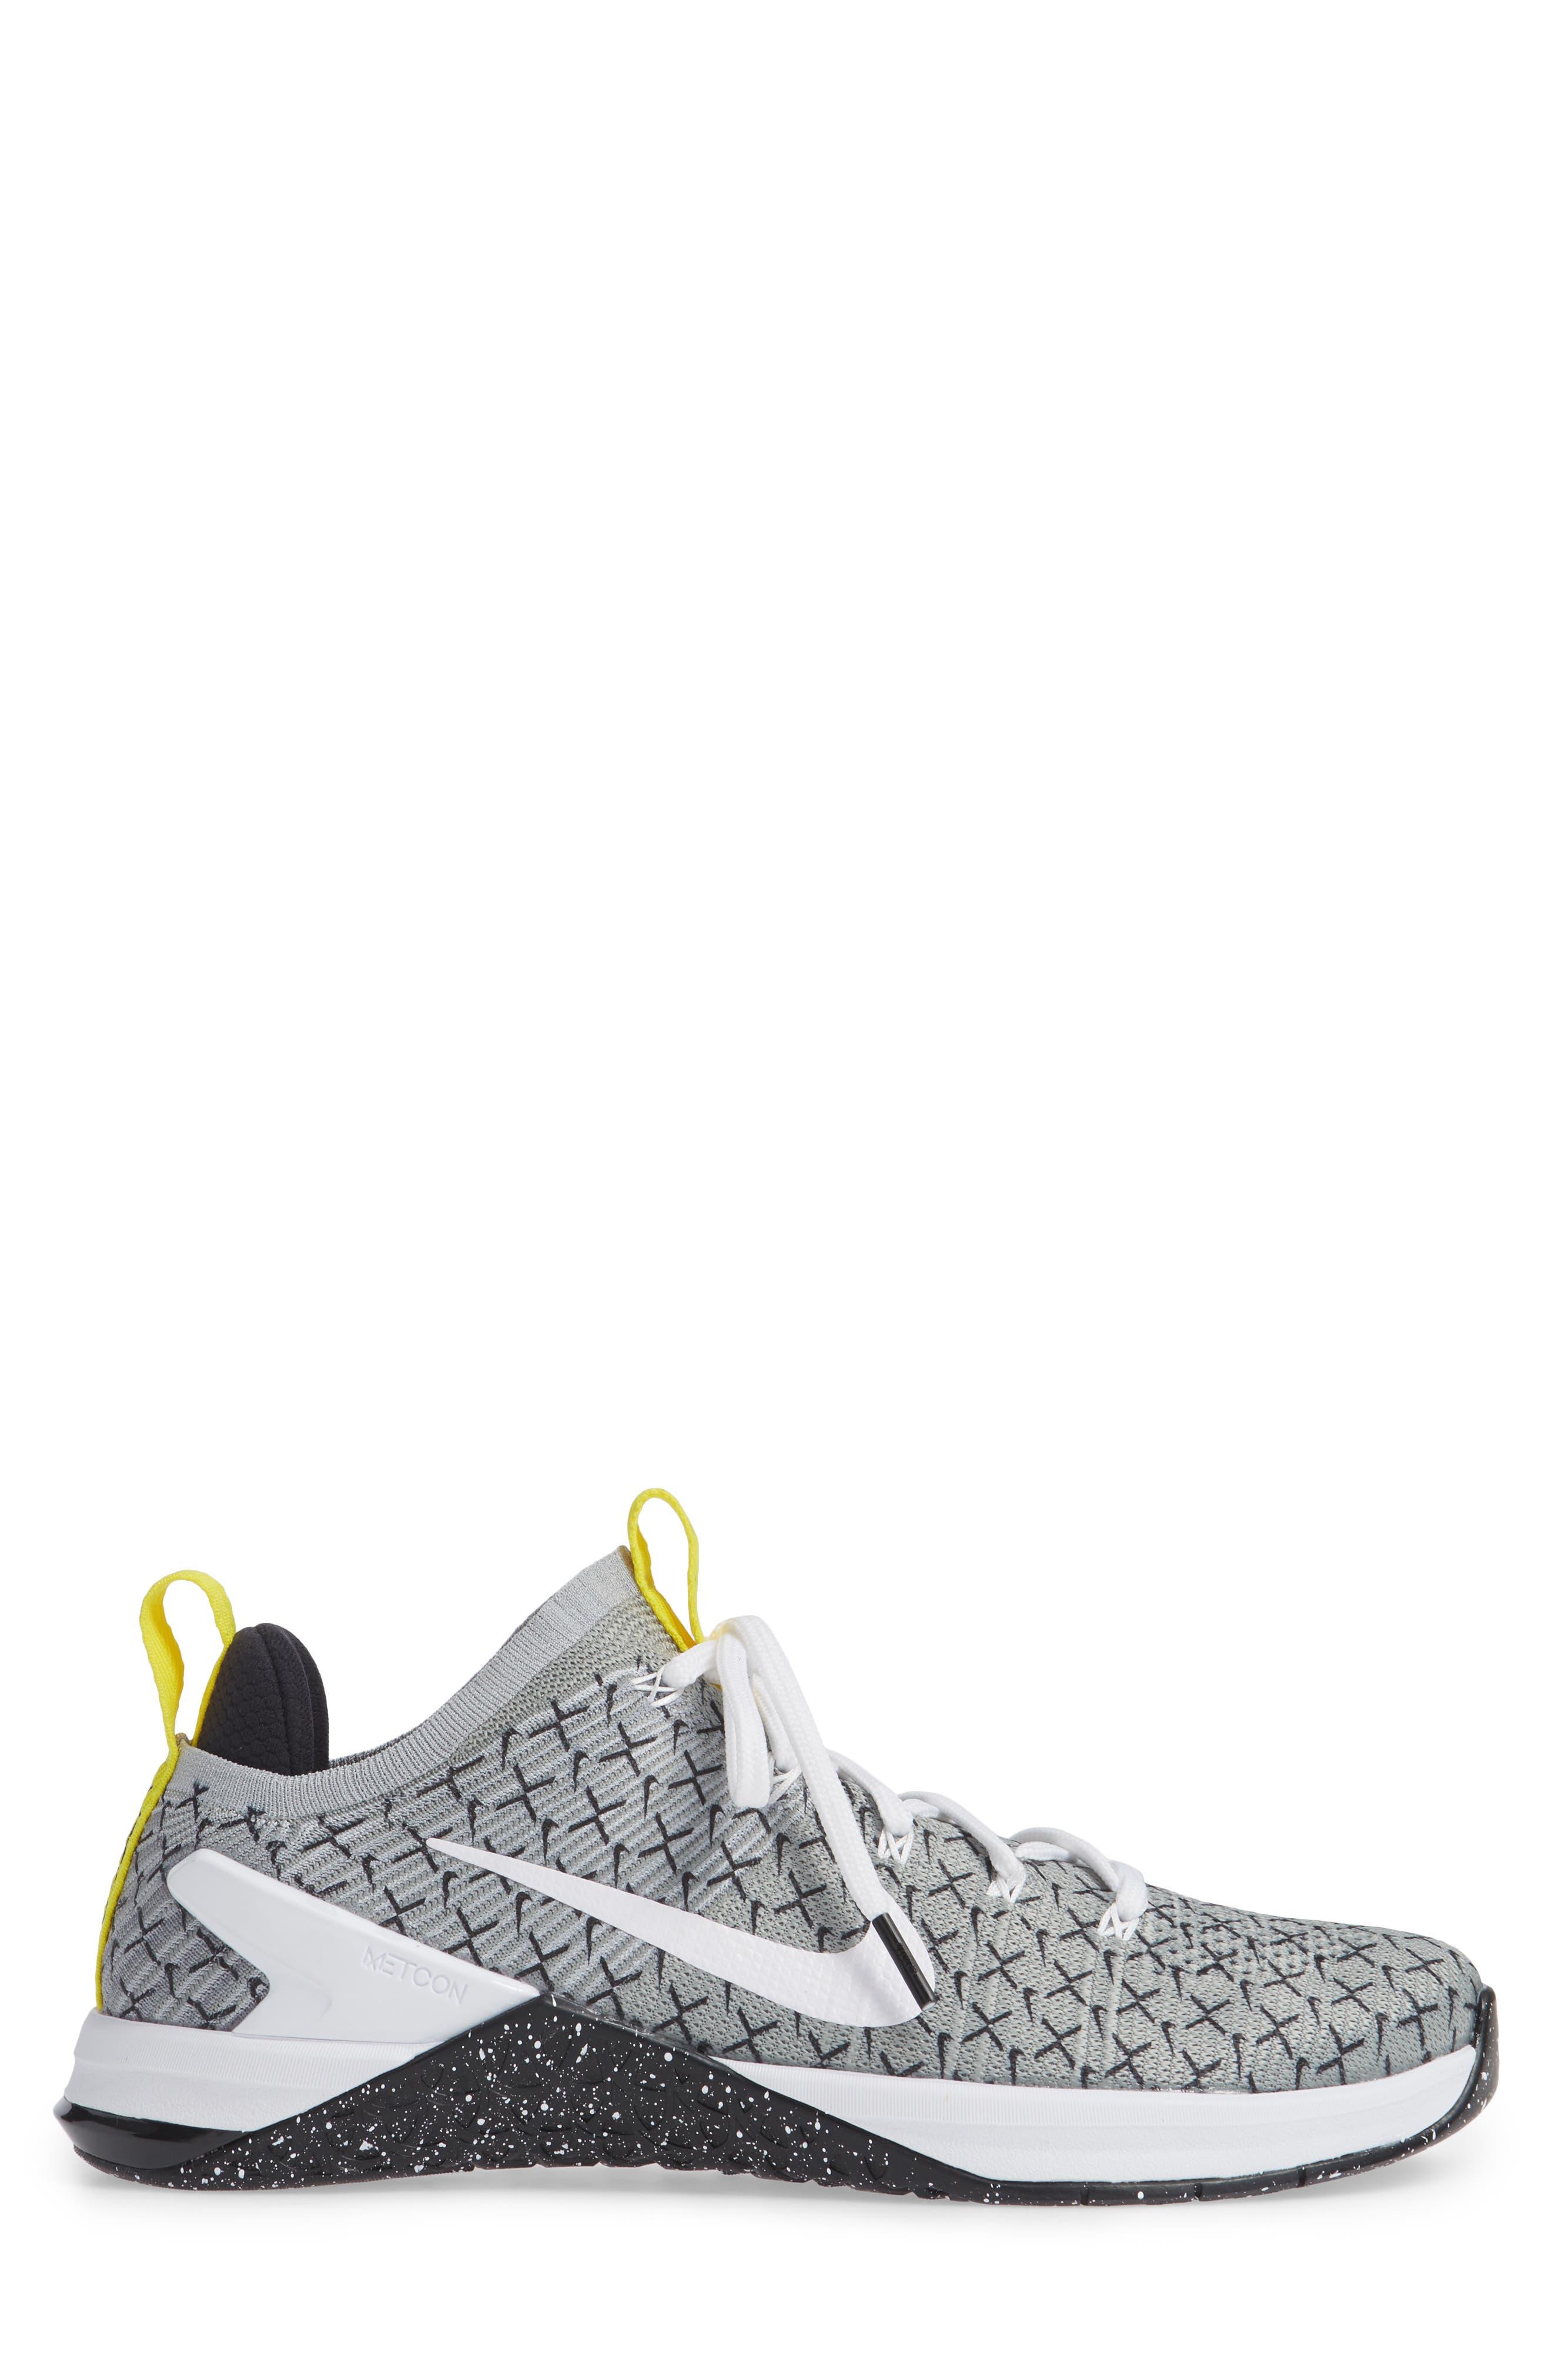 Metcon DSX Flyknit 2 Training Shoe,                             Alternate thumbnail 6, color,                             Black/ White/ Yellow